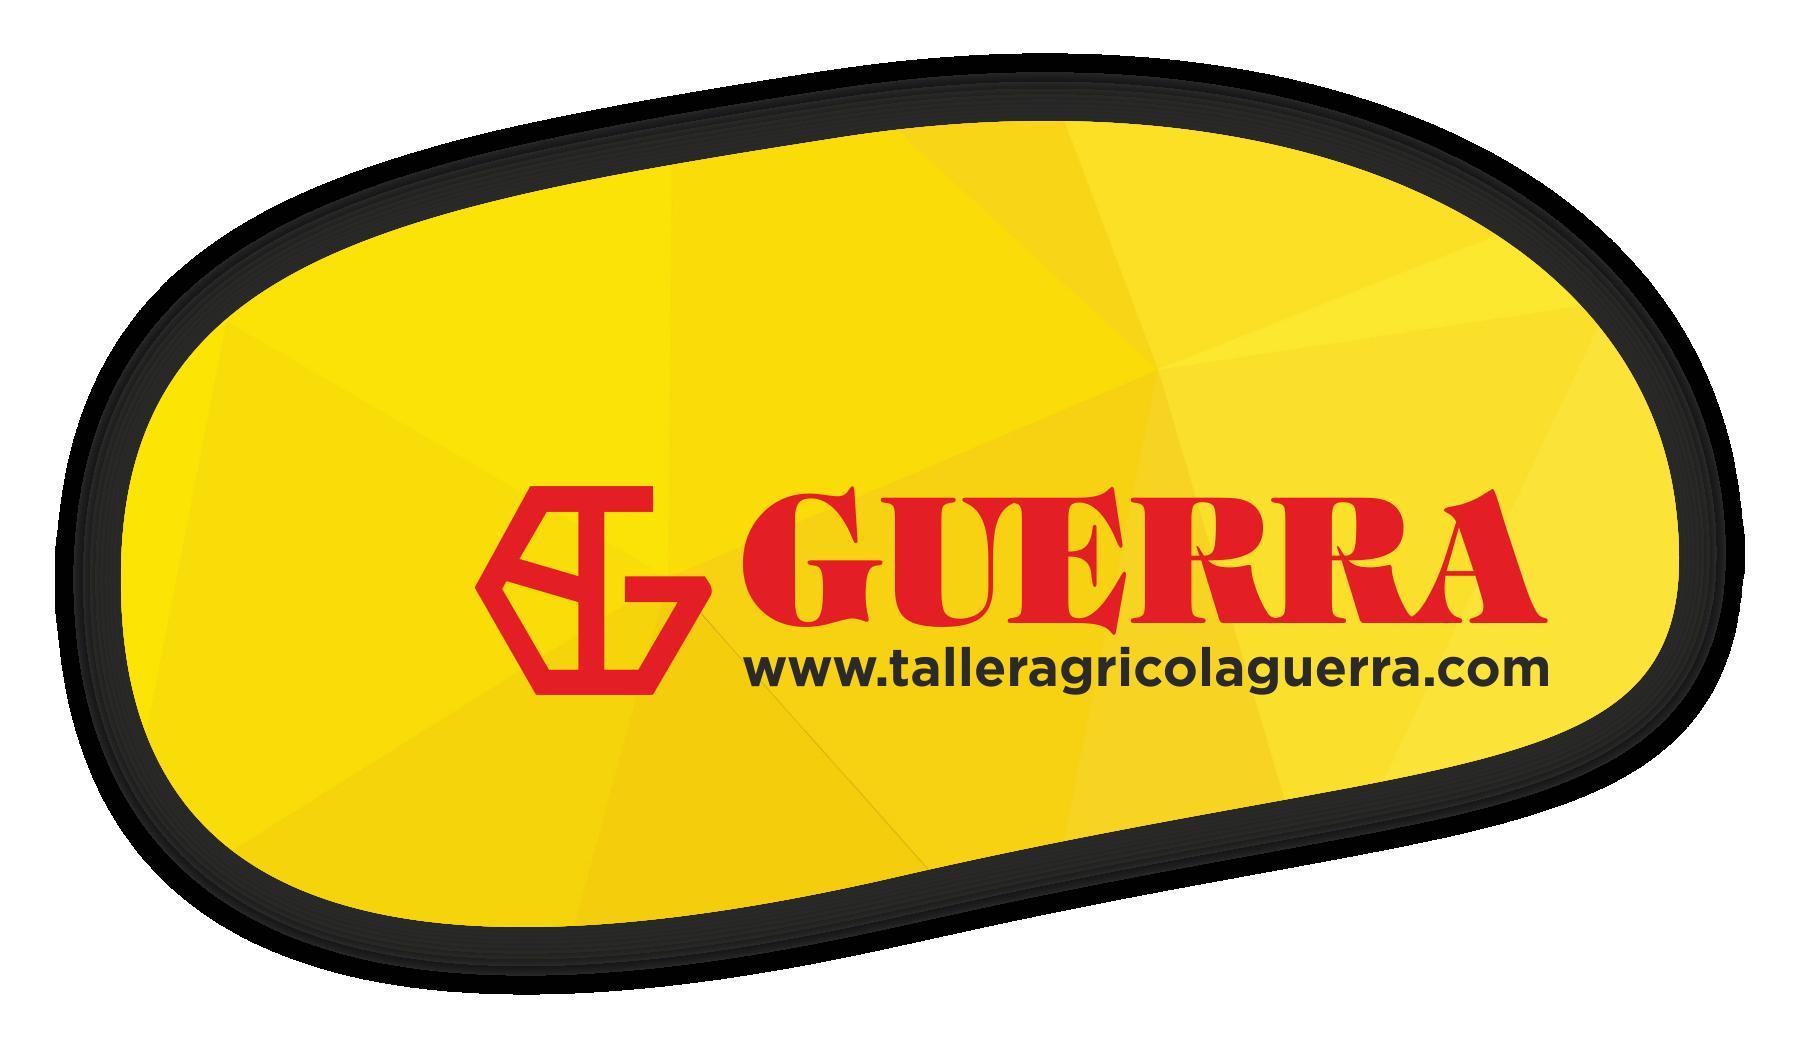 Taller Agrícola Guerra, se consolida como distribuidor de la marca Solà - 1